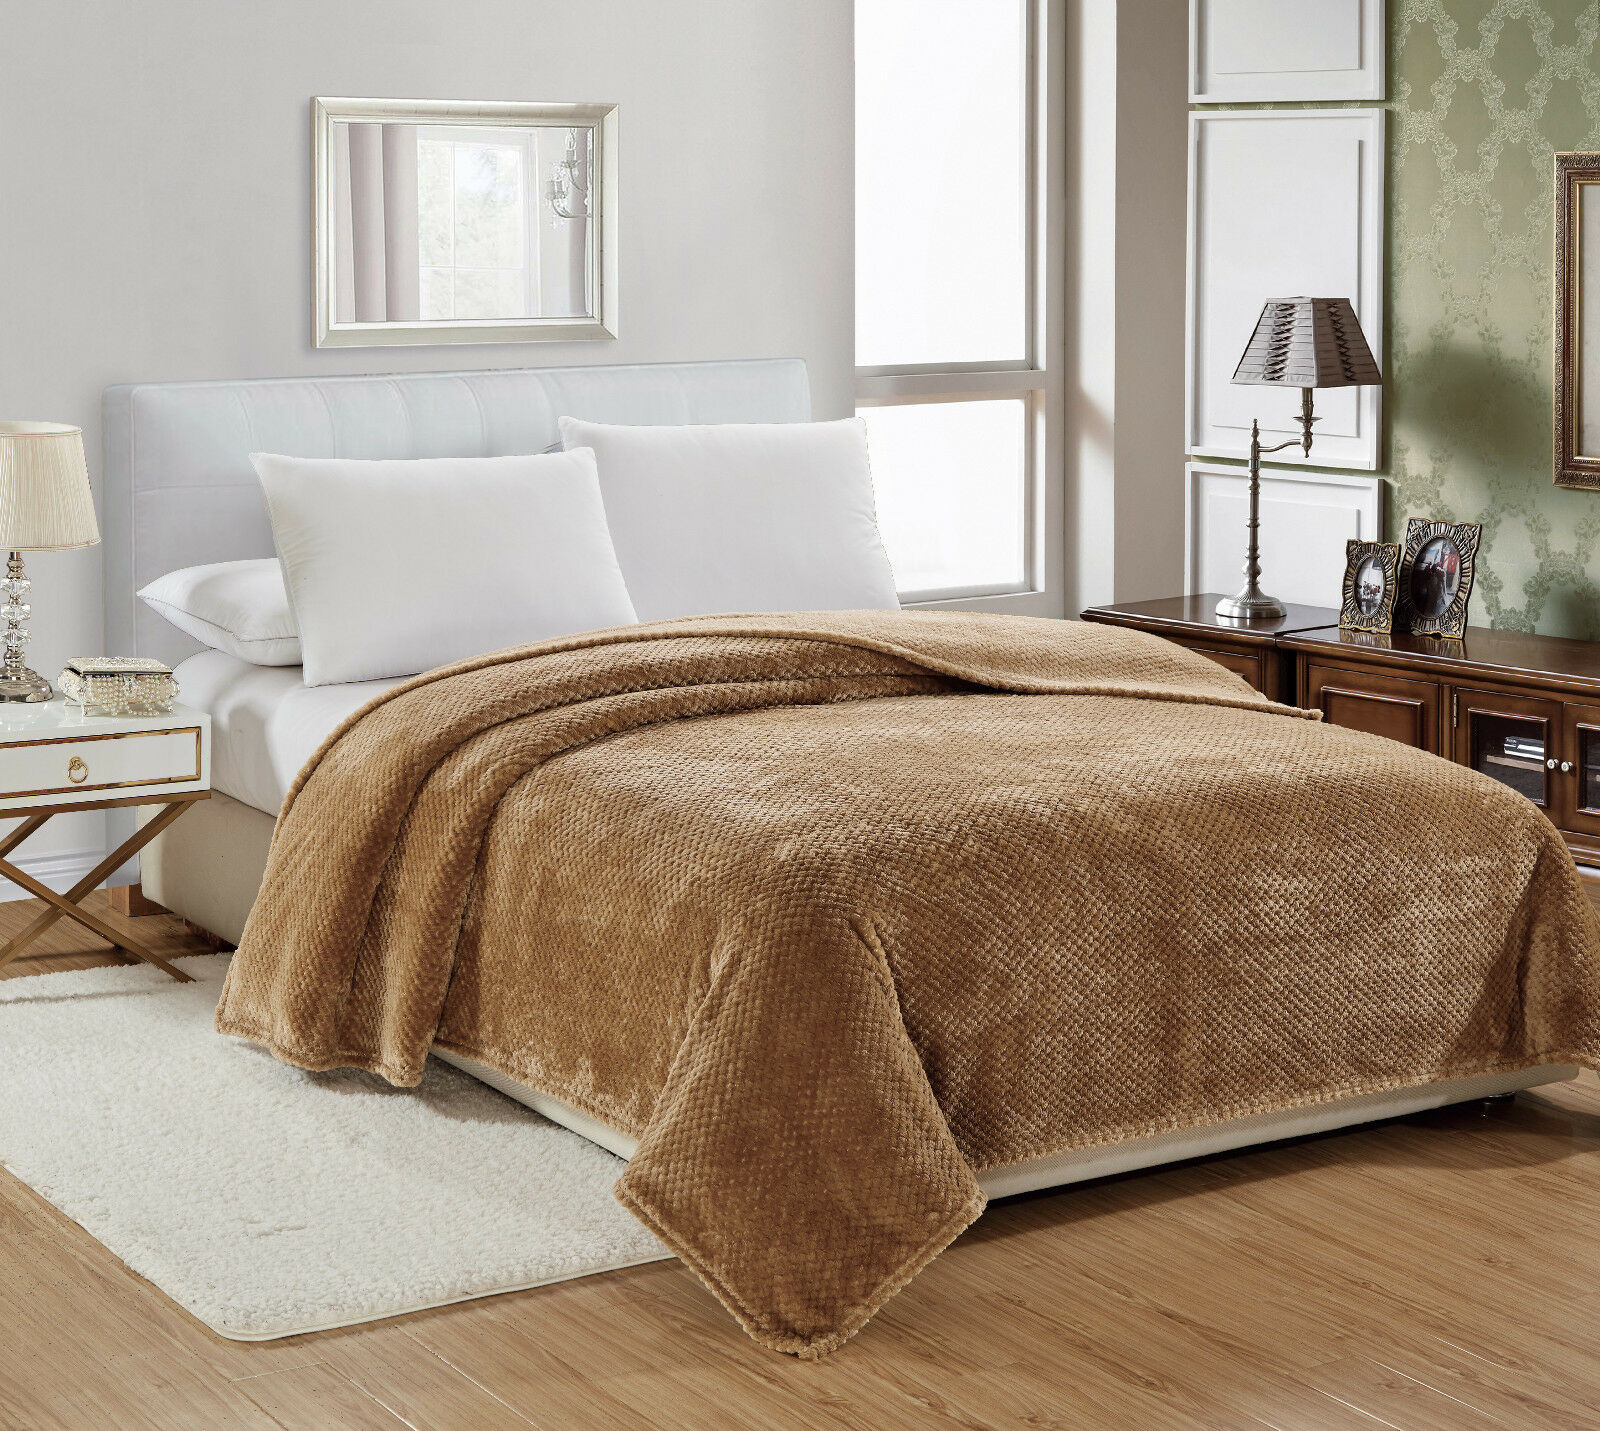 Premium Plush Cozy Fleece Throw Blanket Cover - Assorted Colors & Styles